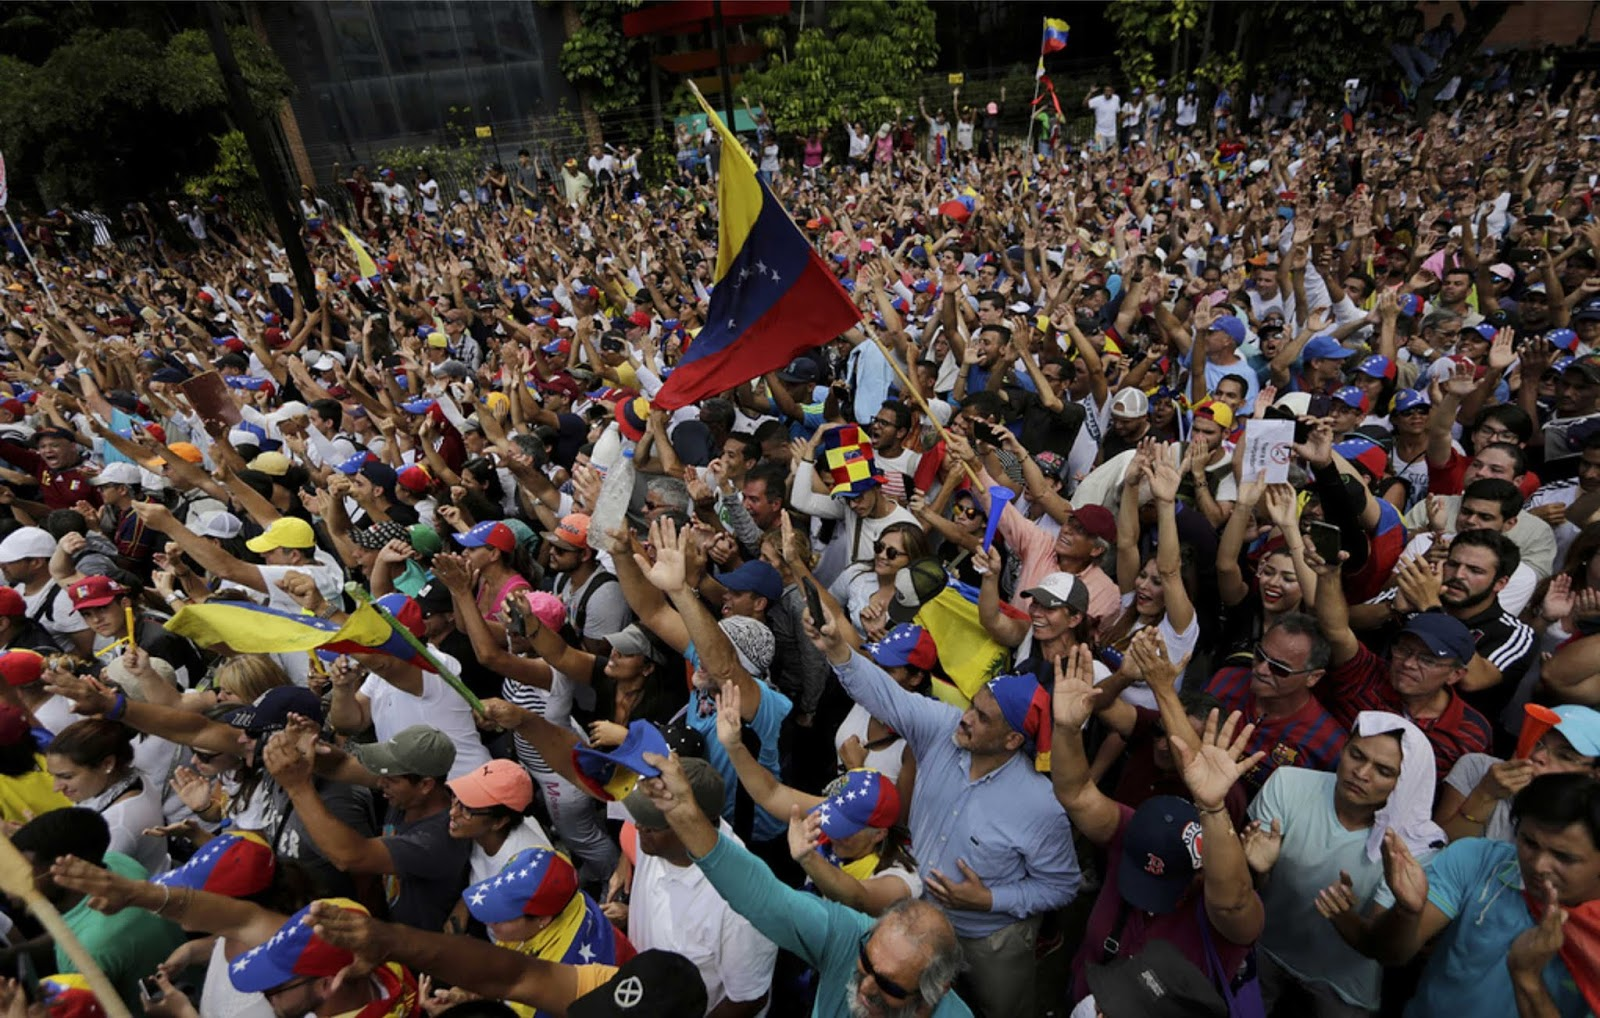 Bukan hanya di Venezuela AS juga ingin mengganti pemerintahan Nikaragua dan Kuba